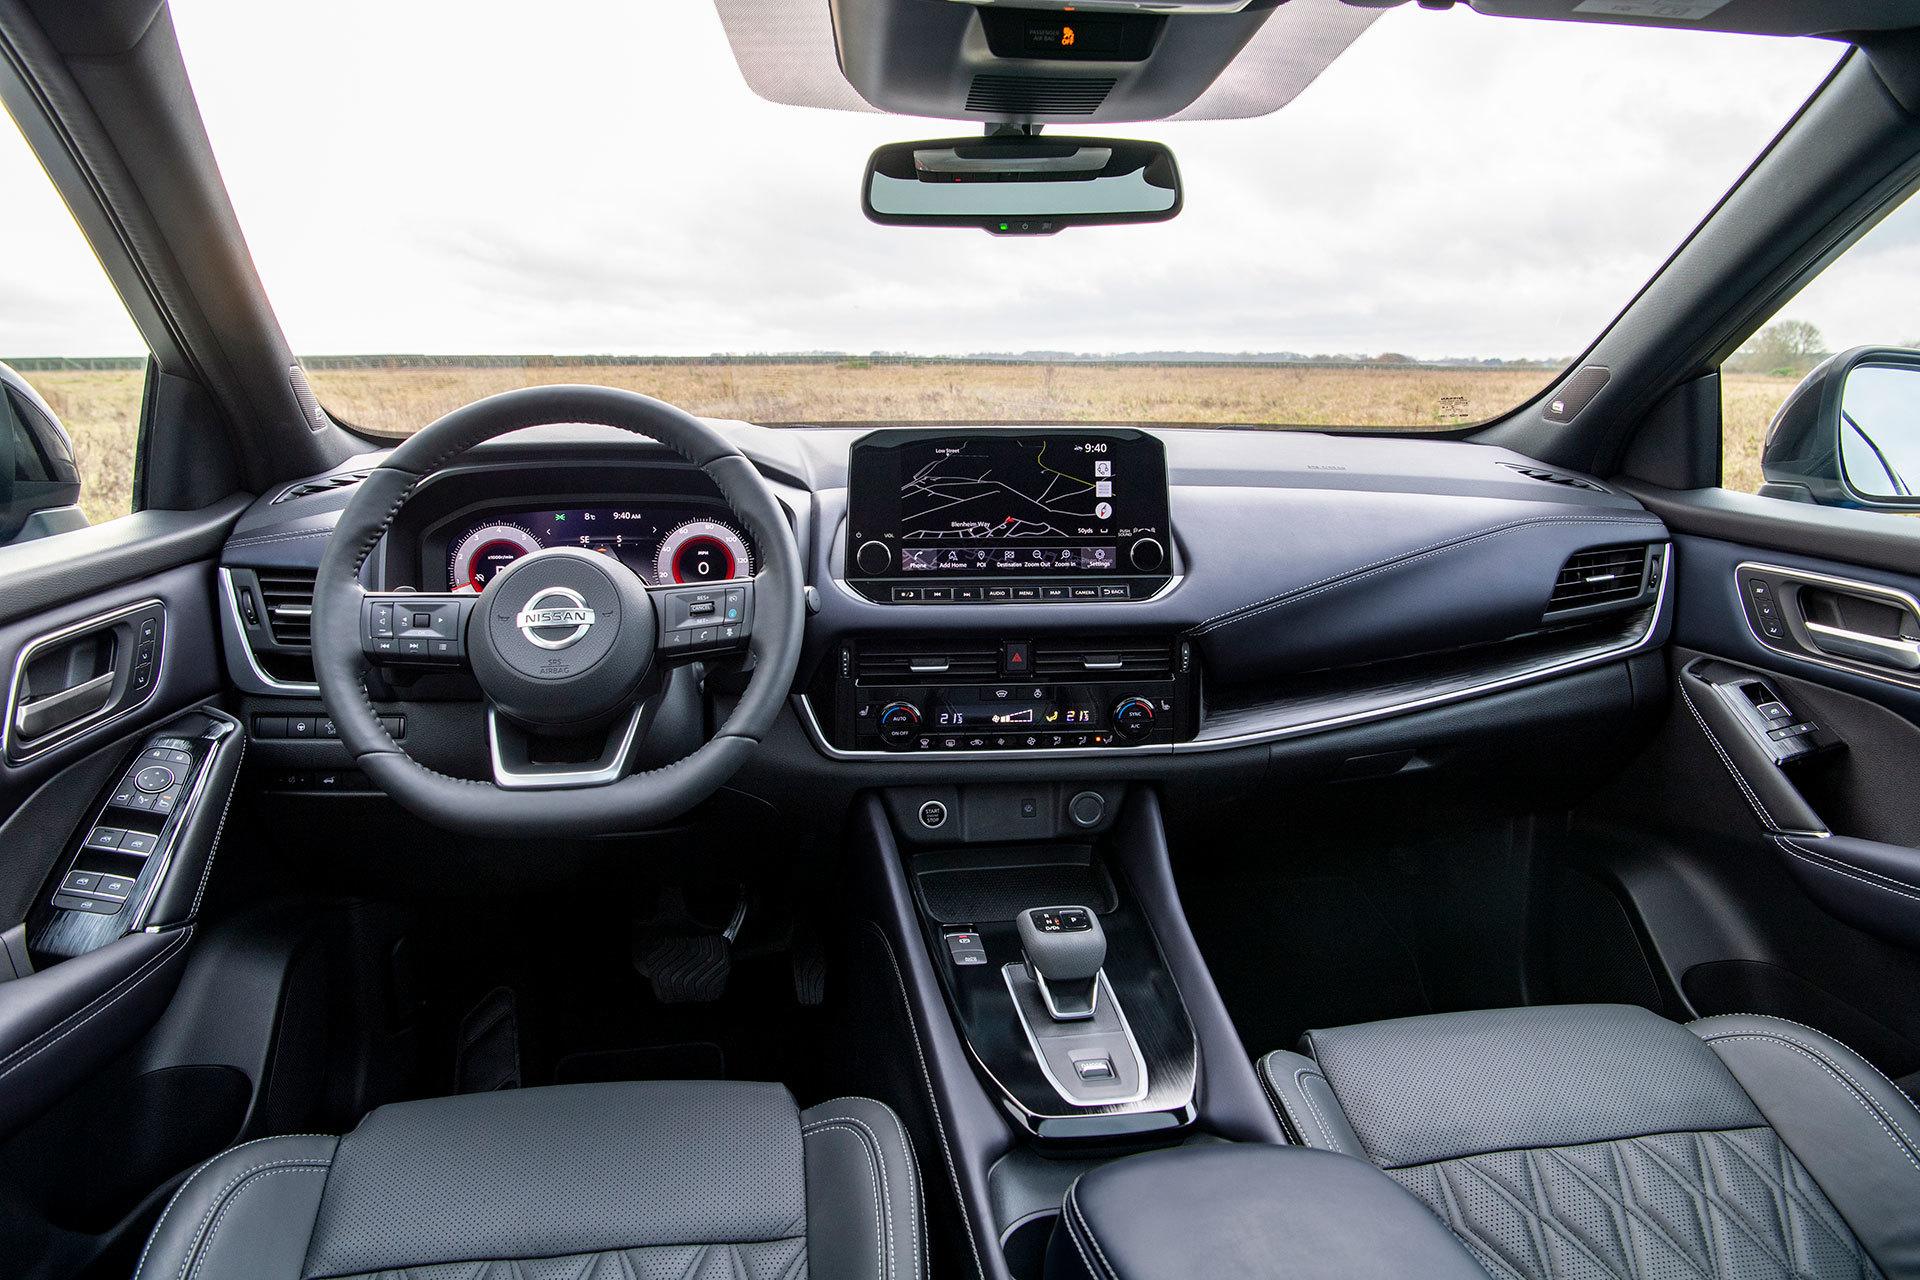 Nissan Qashqai 2021 Interior 04